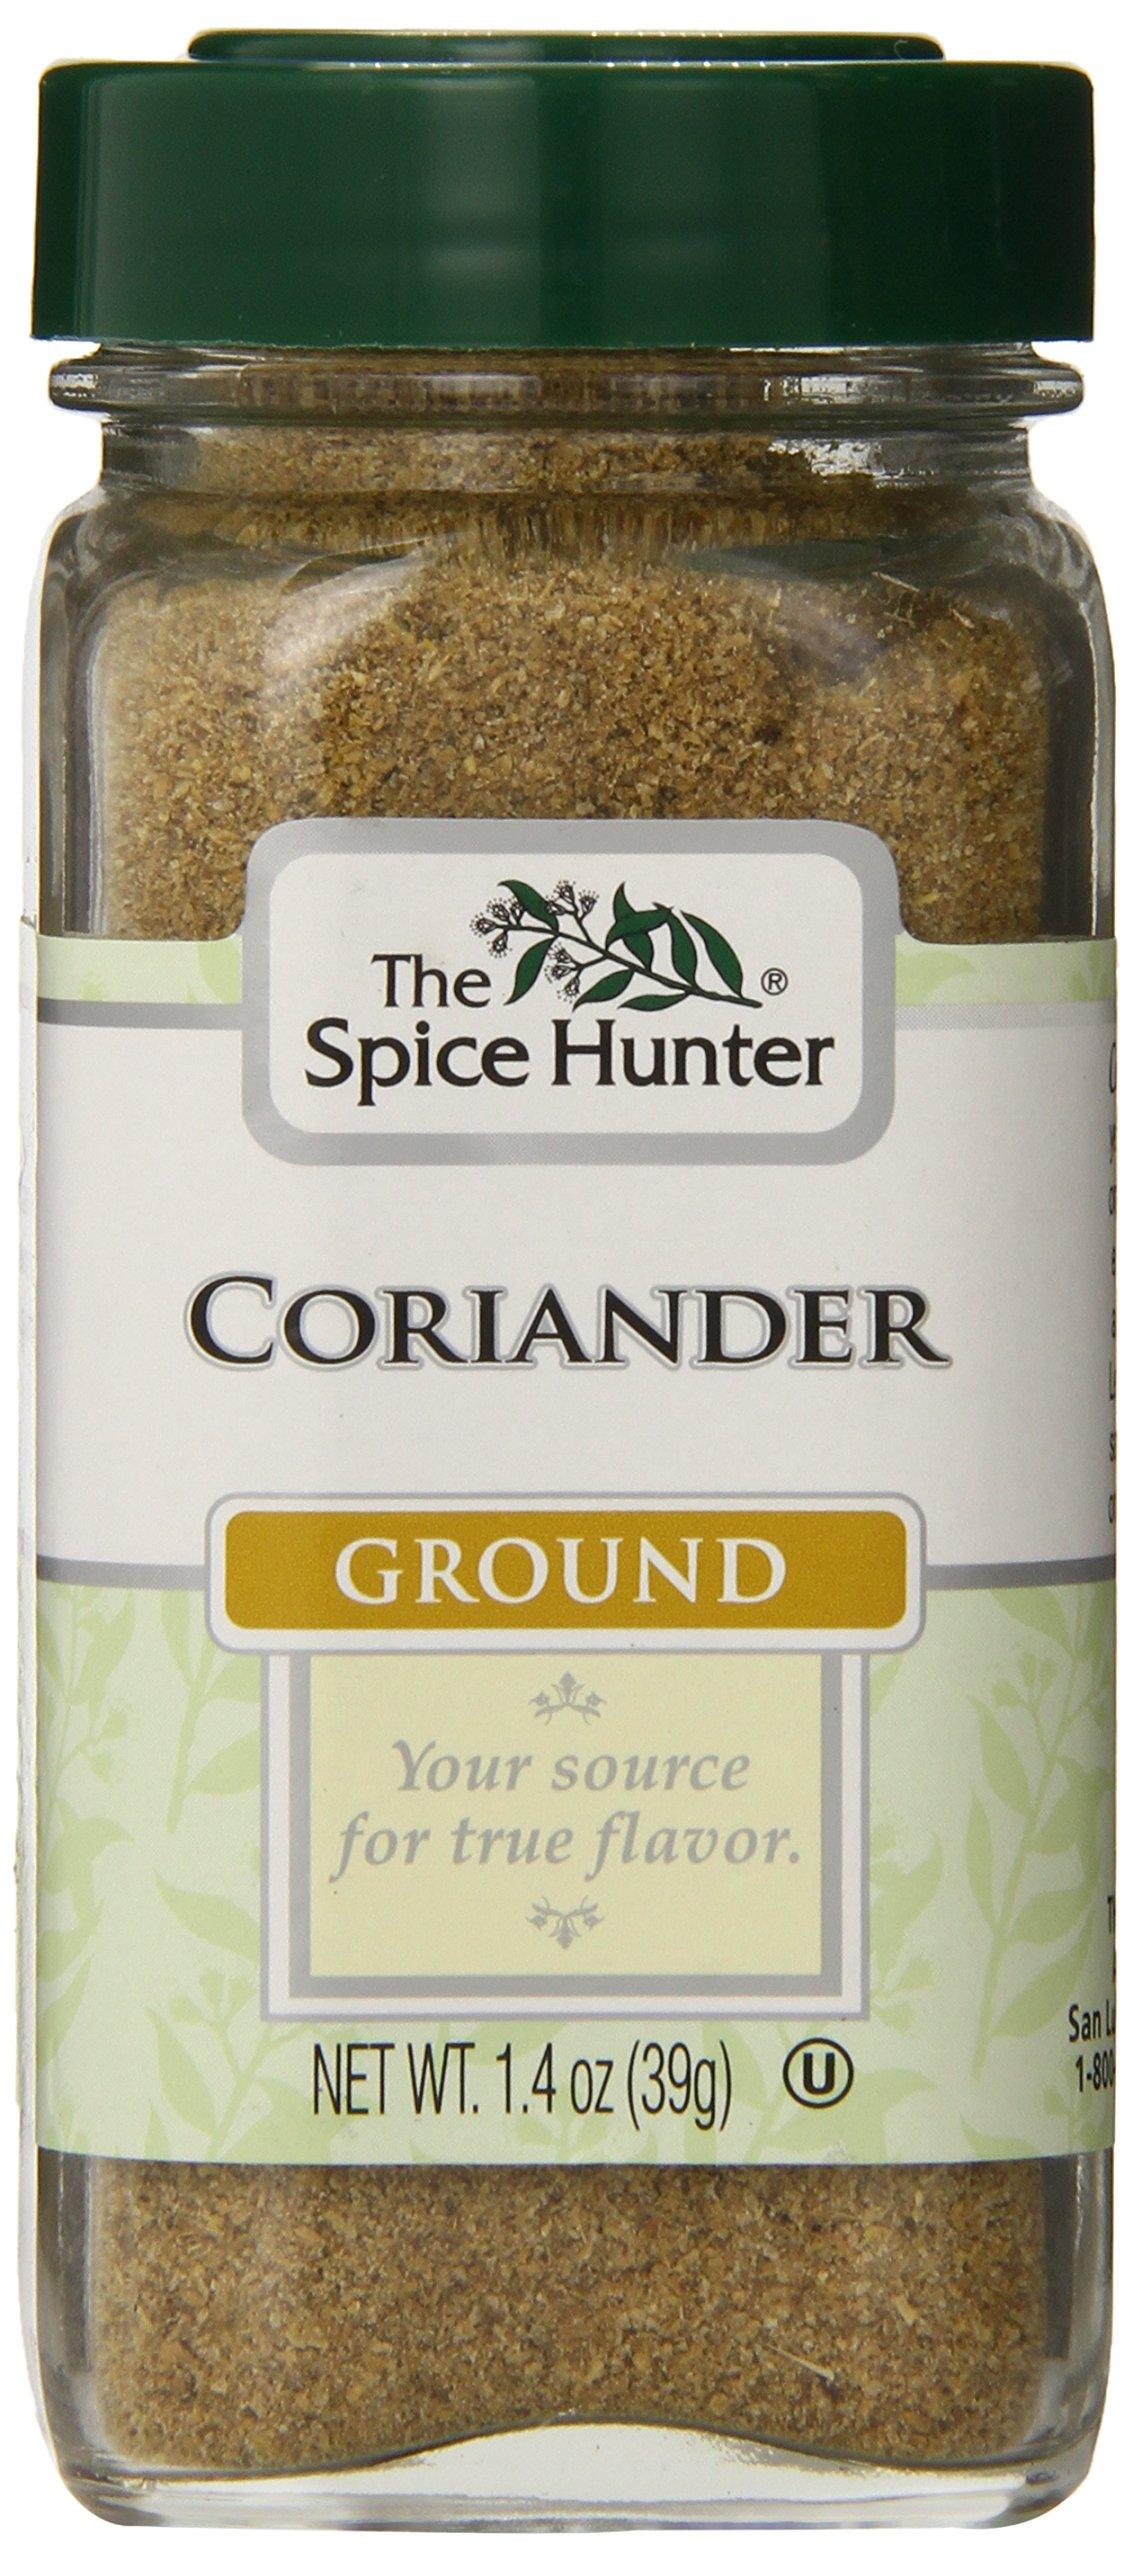 The Spice Hunter Coriander, Moroccan, Ground, 1.4-Ounce Jar